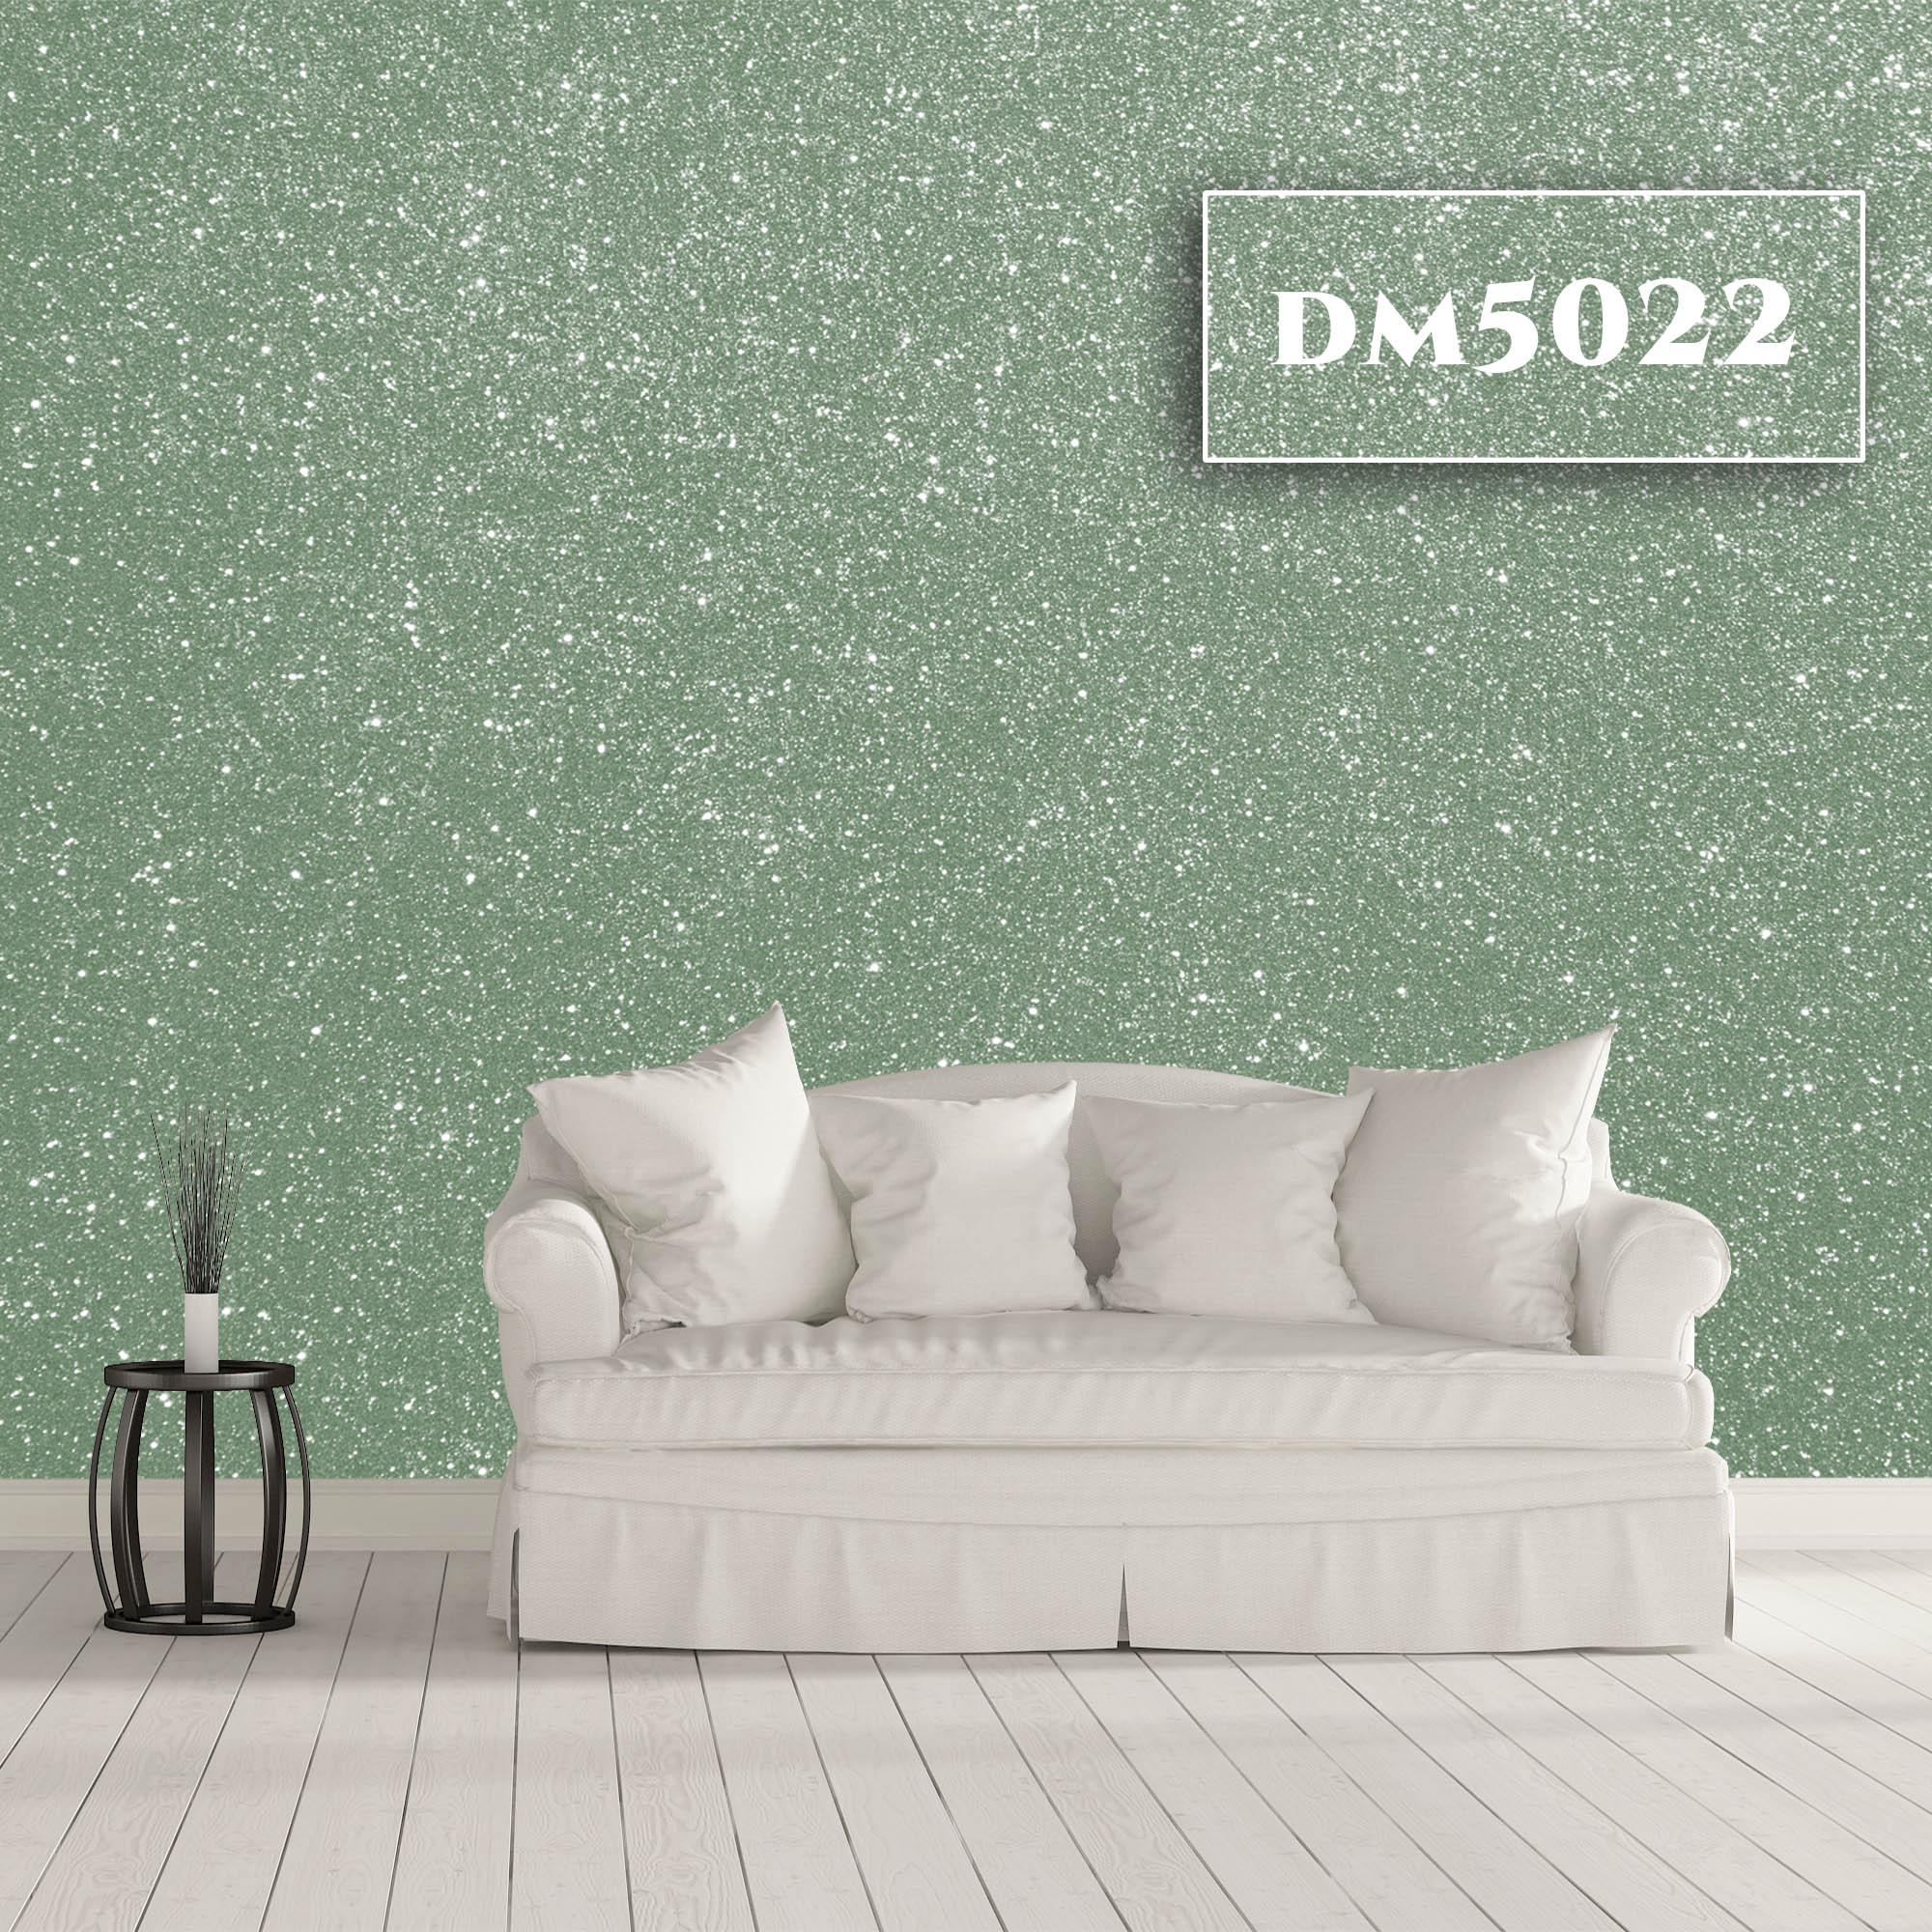 DM5022